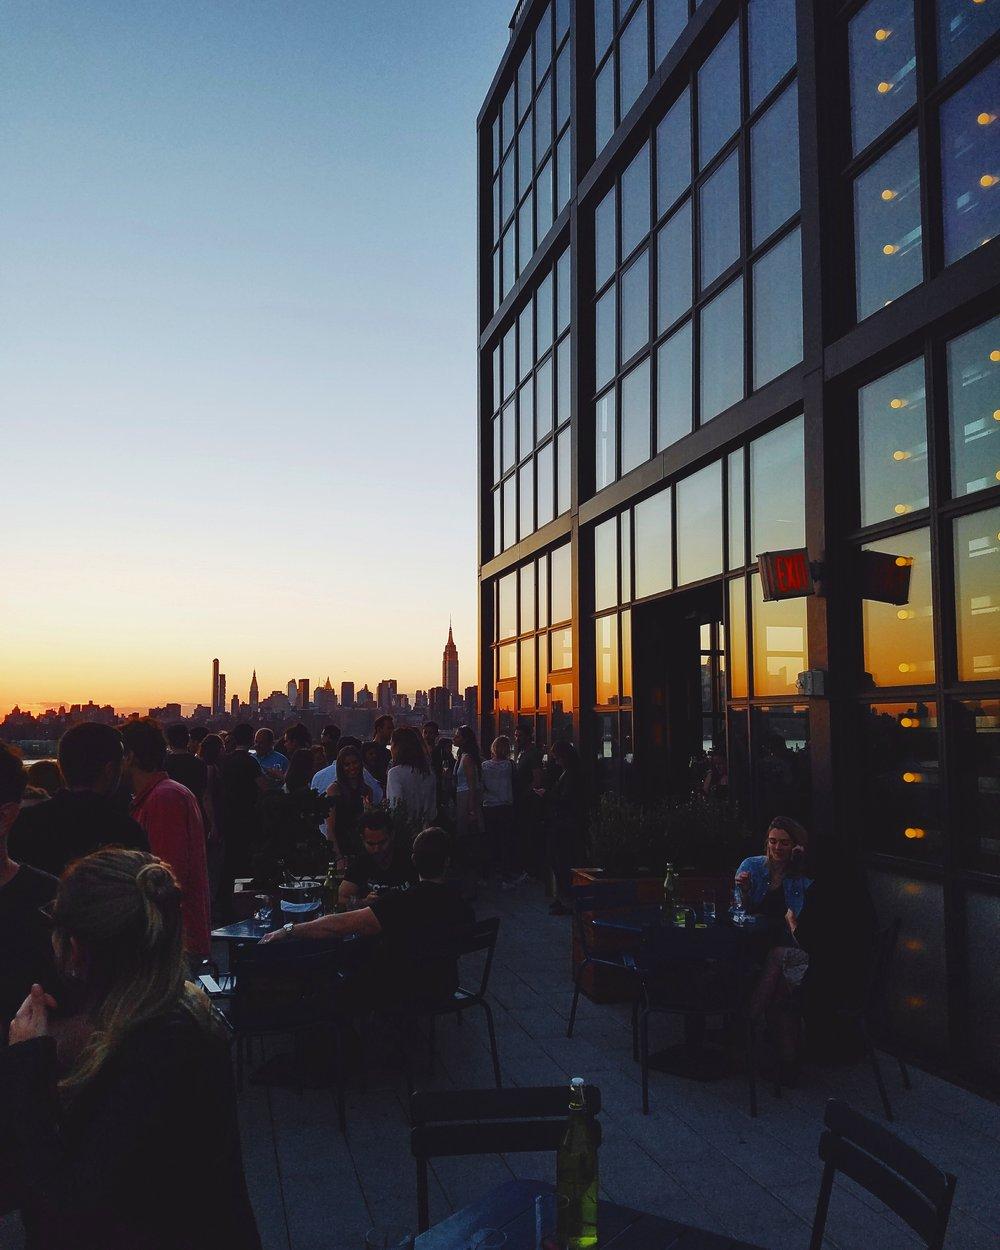 5 - Wythe rooftop.jpg